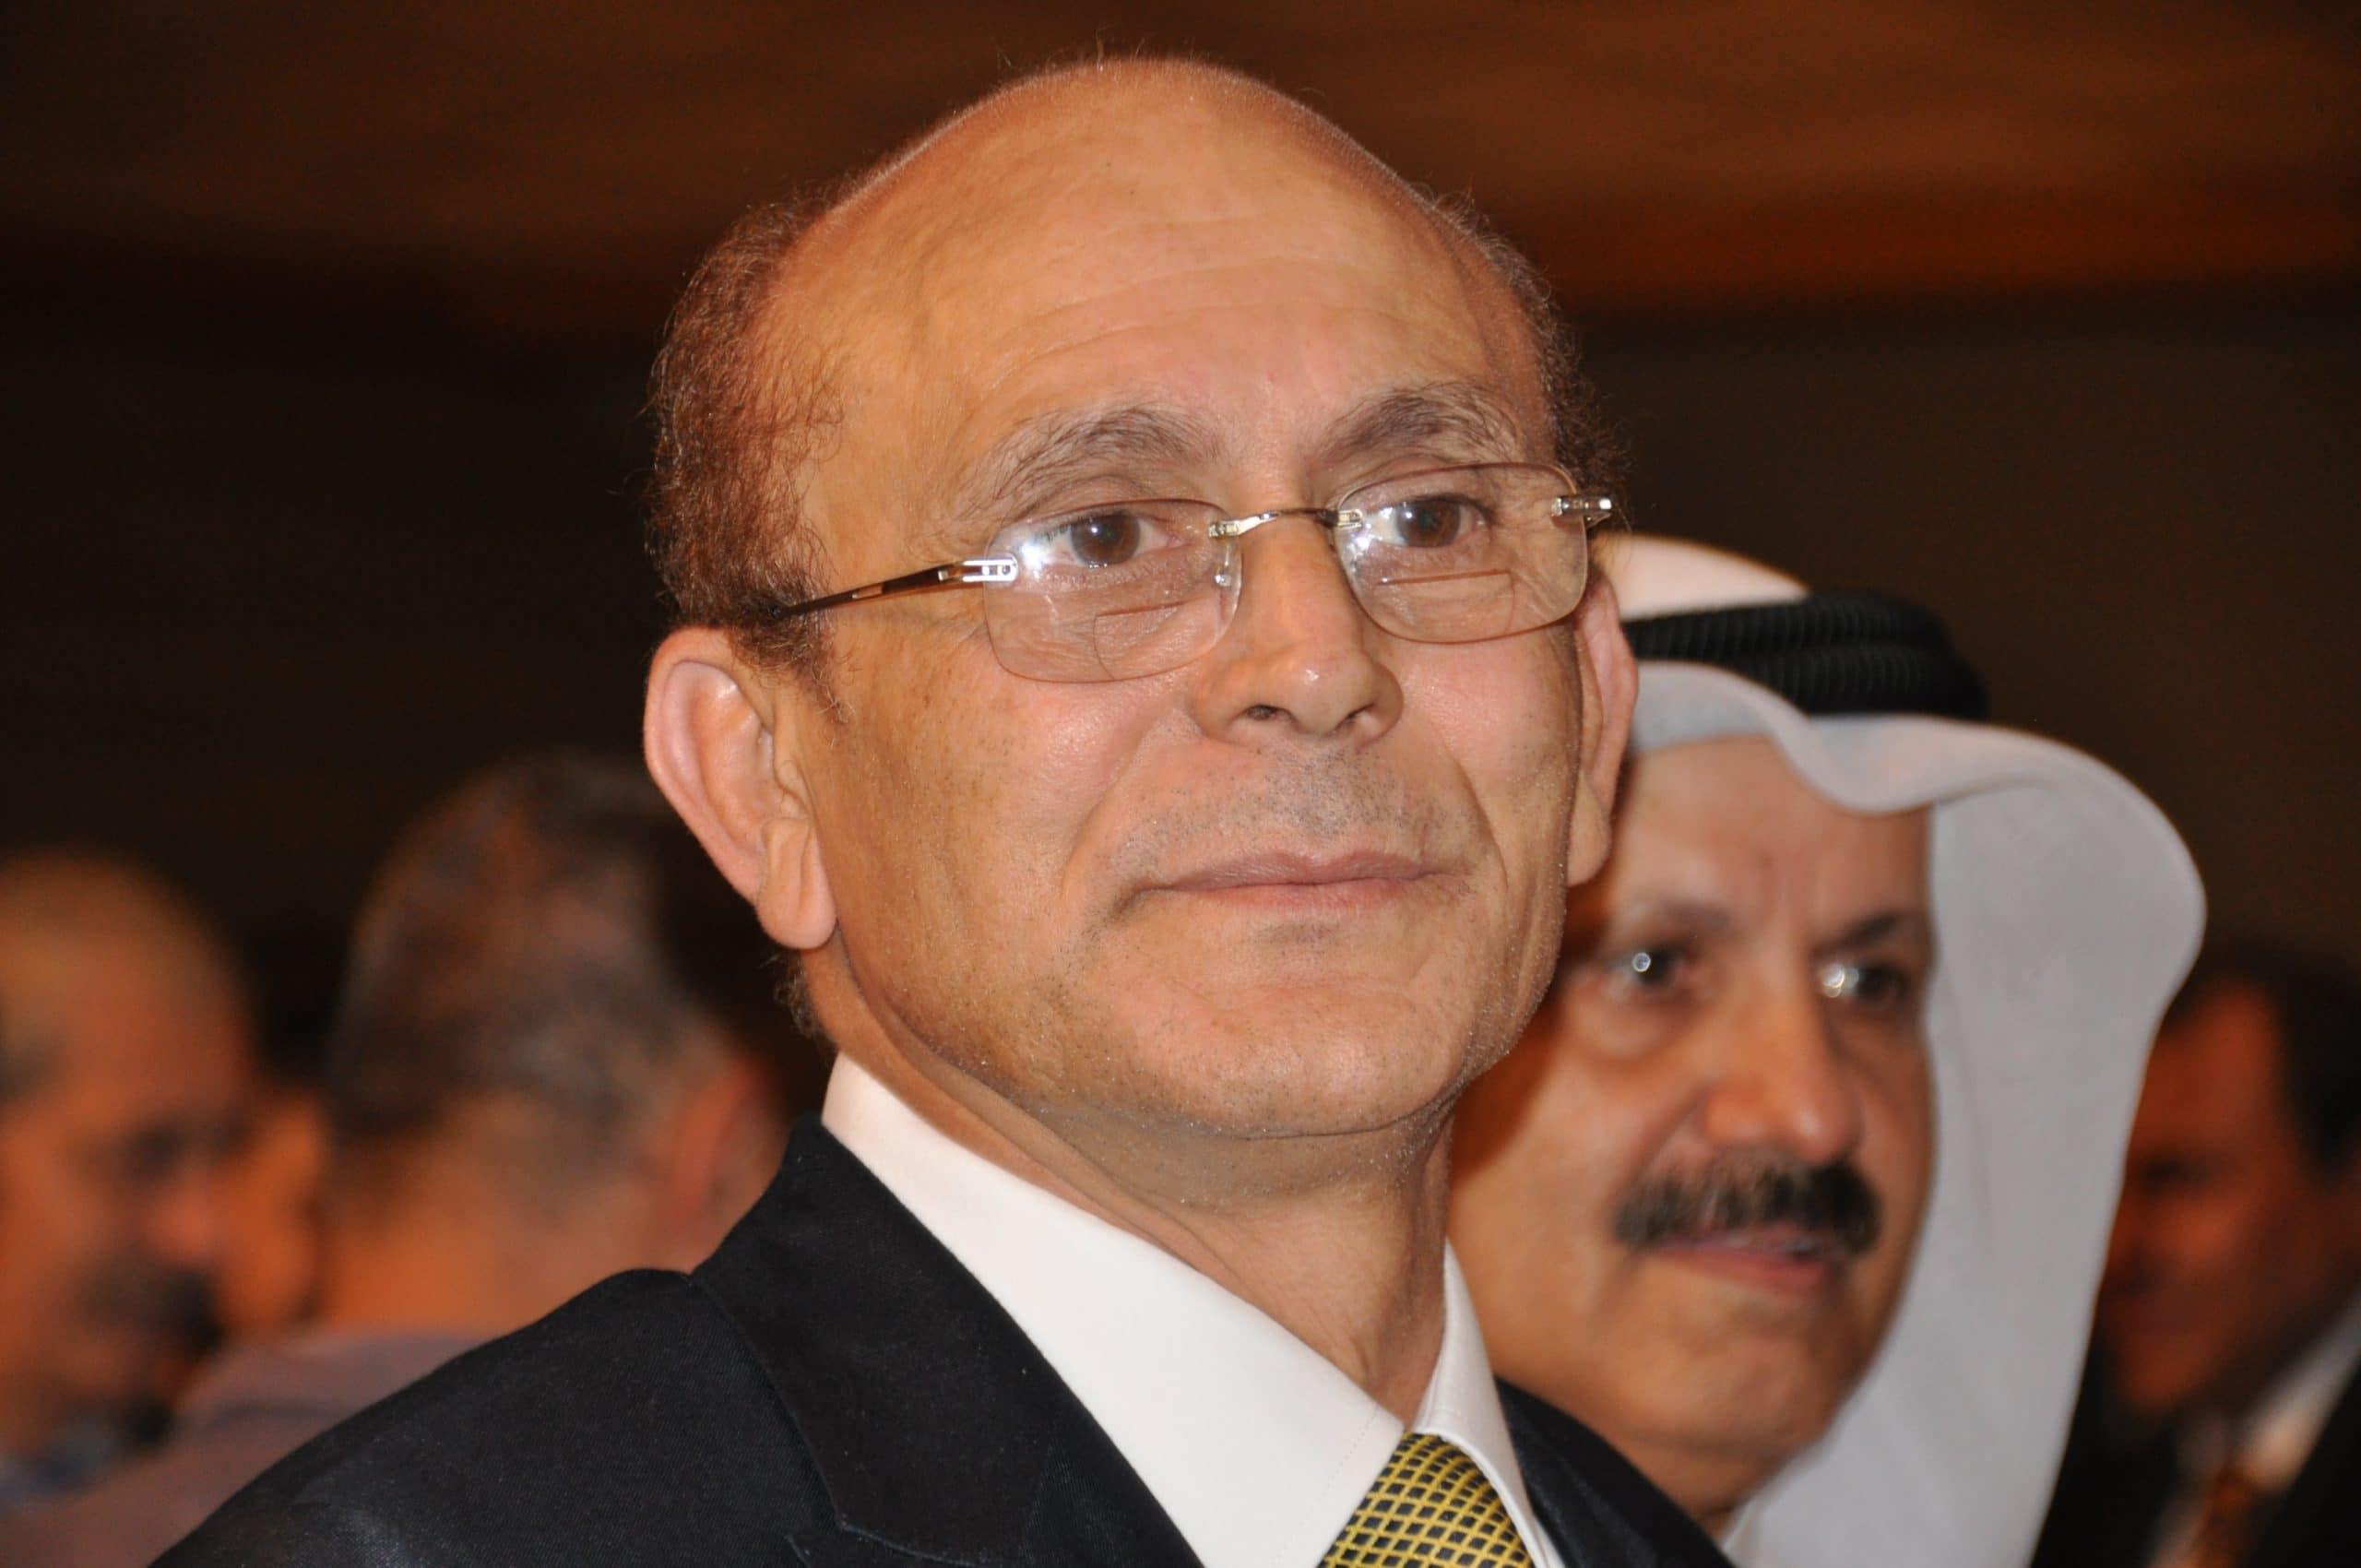 محمد صبحى اشتغلت كومبارس 7 سنوات